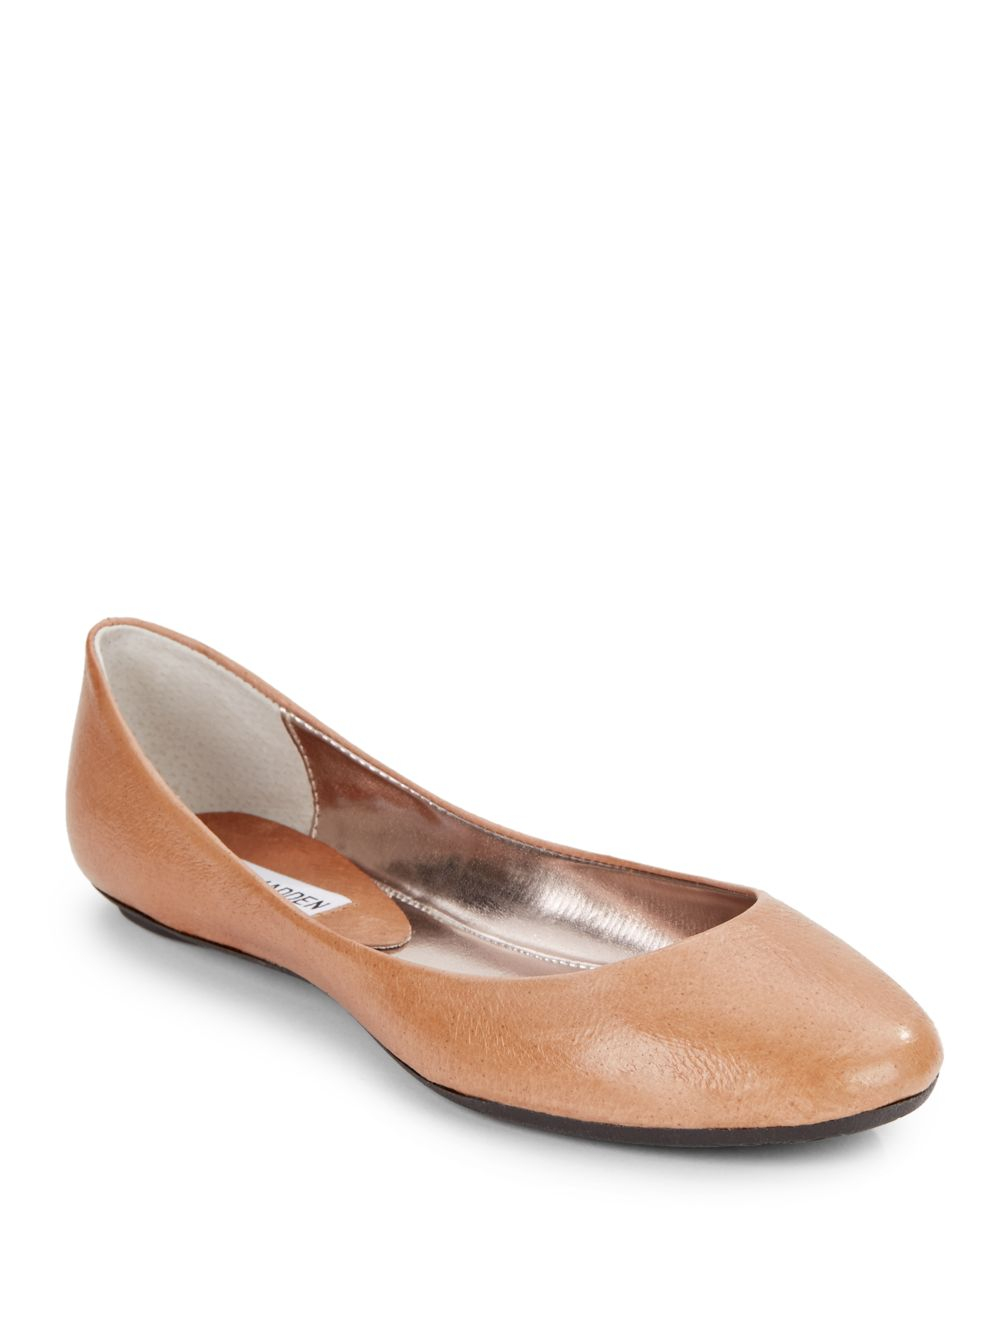 Steve Madden Heaven Brown Flats Ballet Shoes Womens Leather Cognac